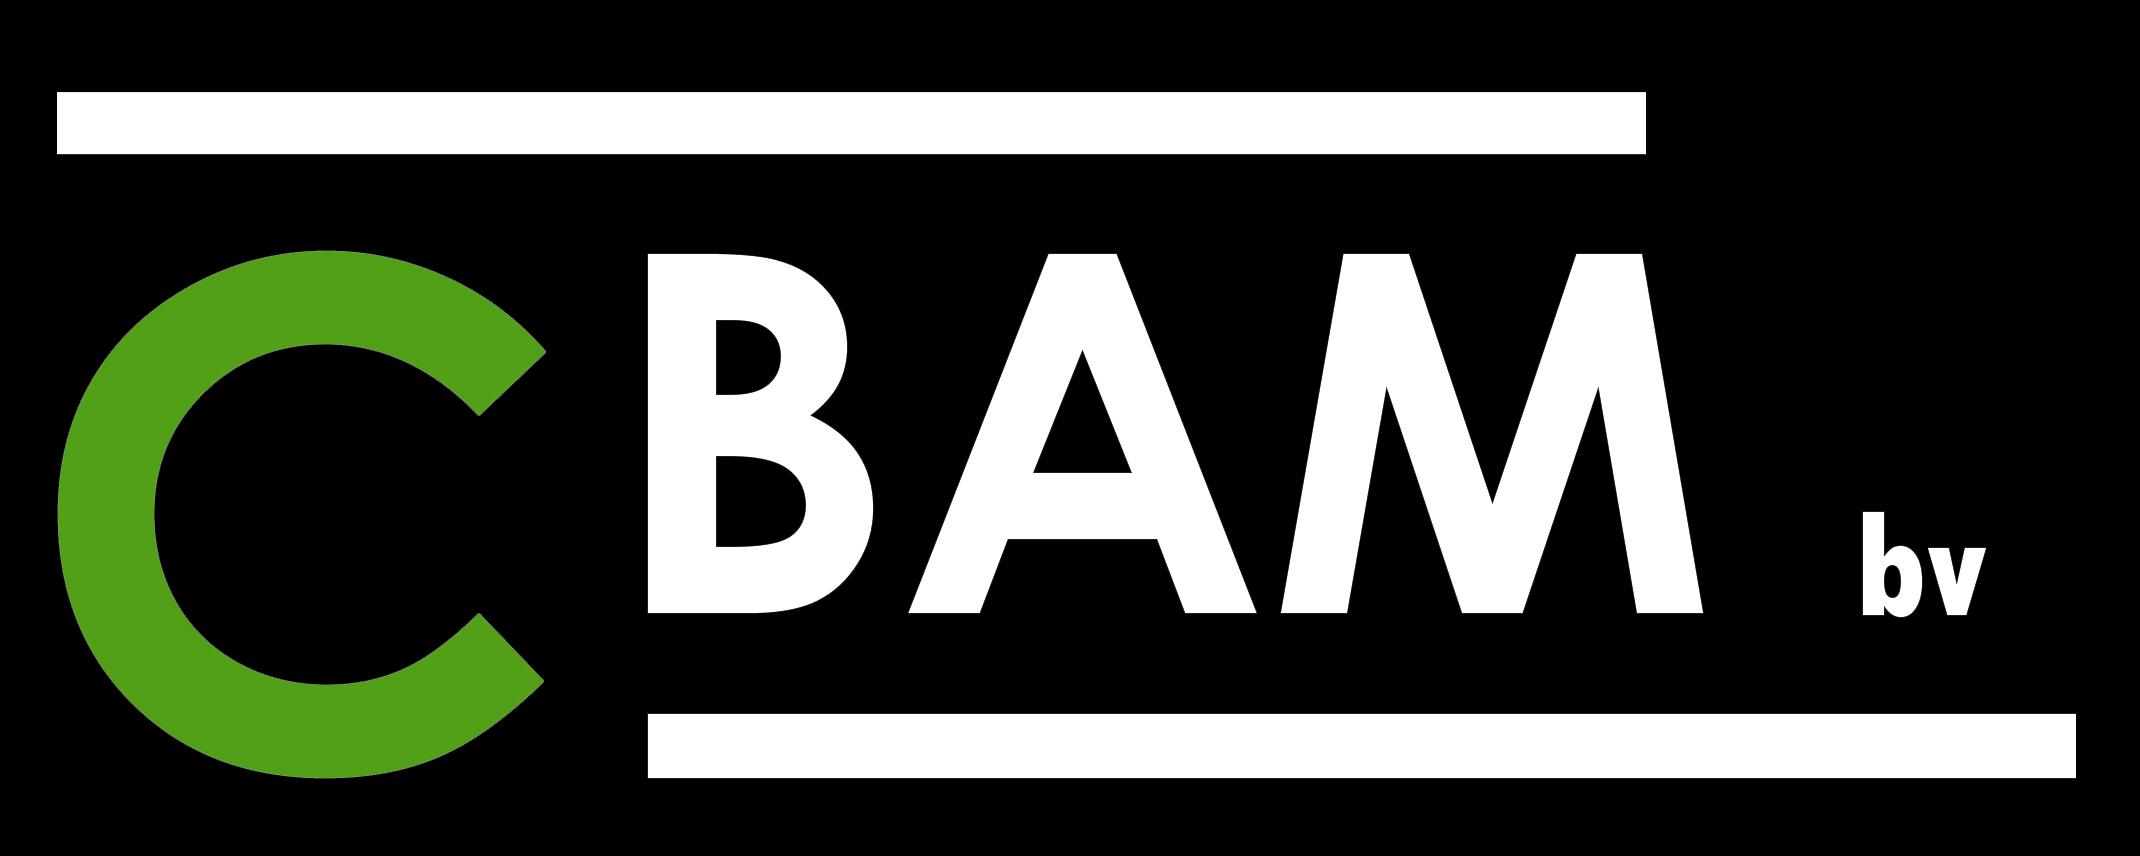 CBAM Engineering - Ontwerp op basis van geavanceerde berekeningen